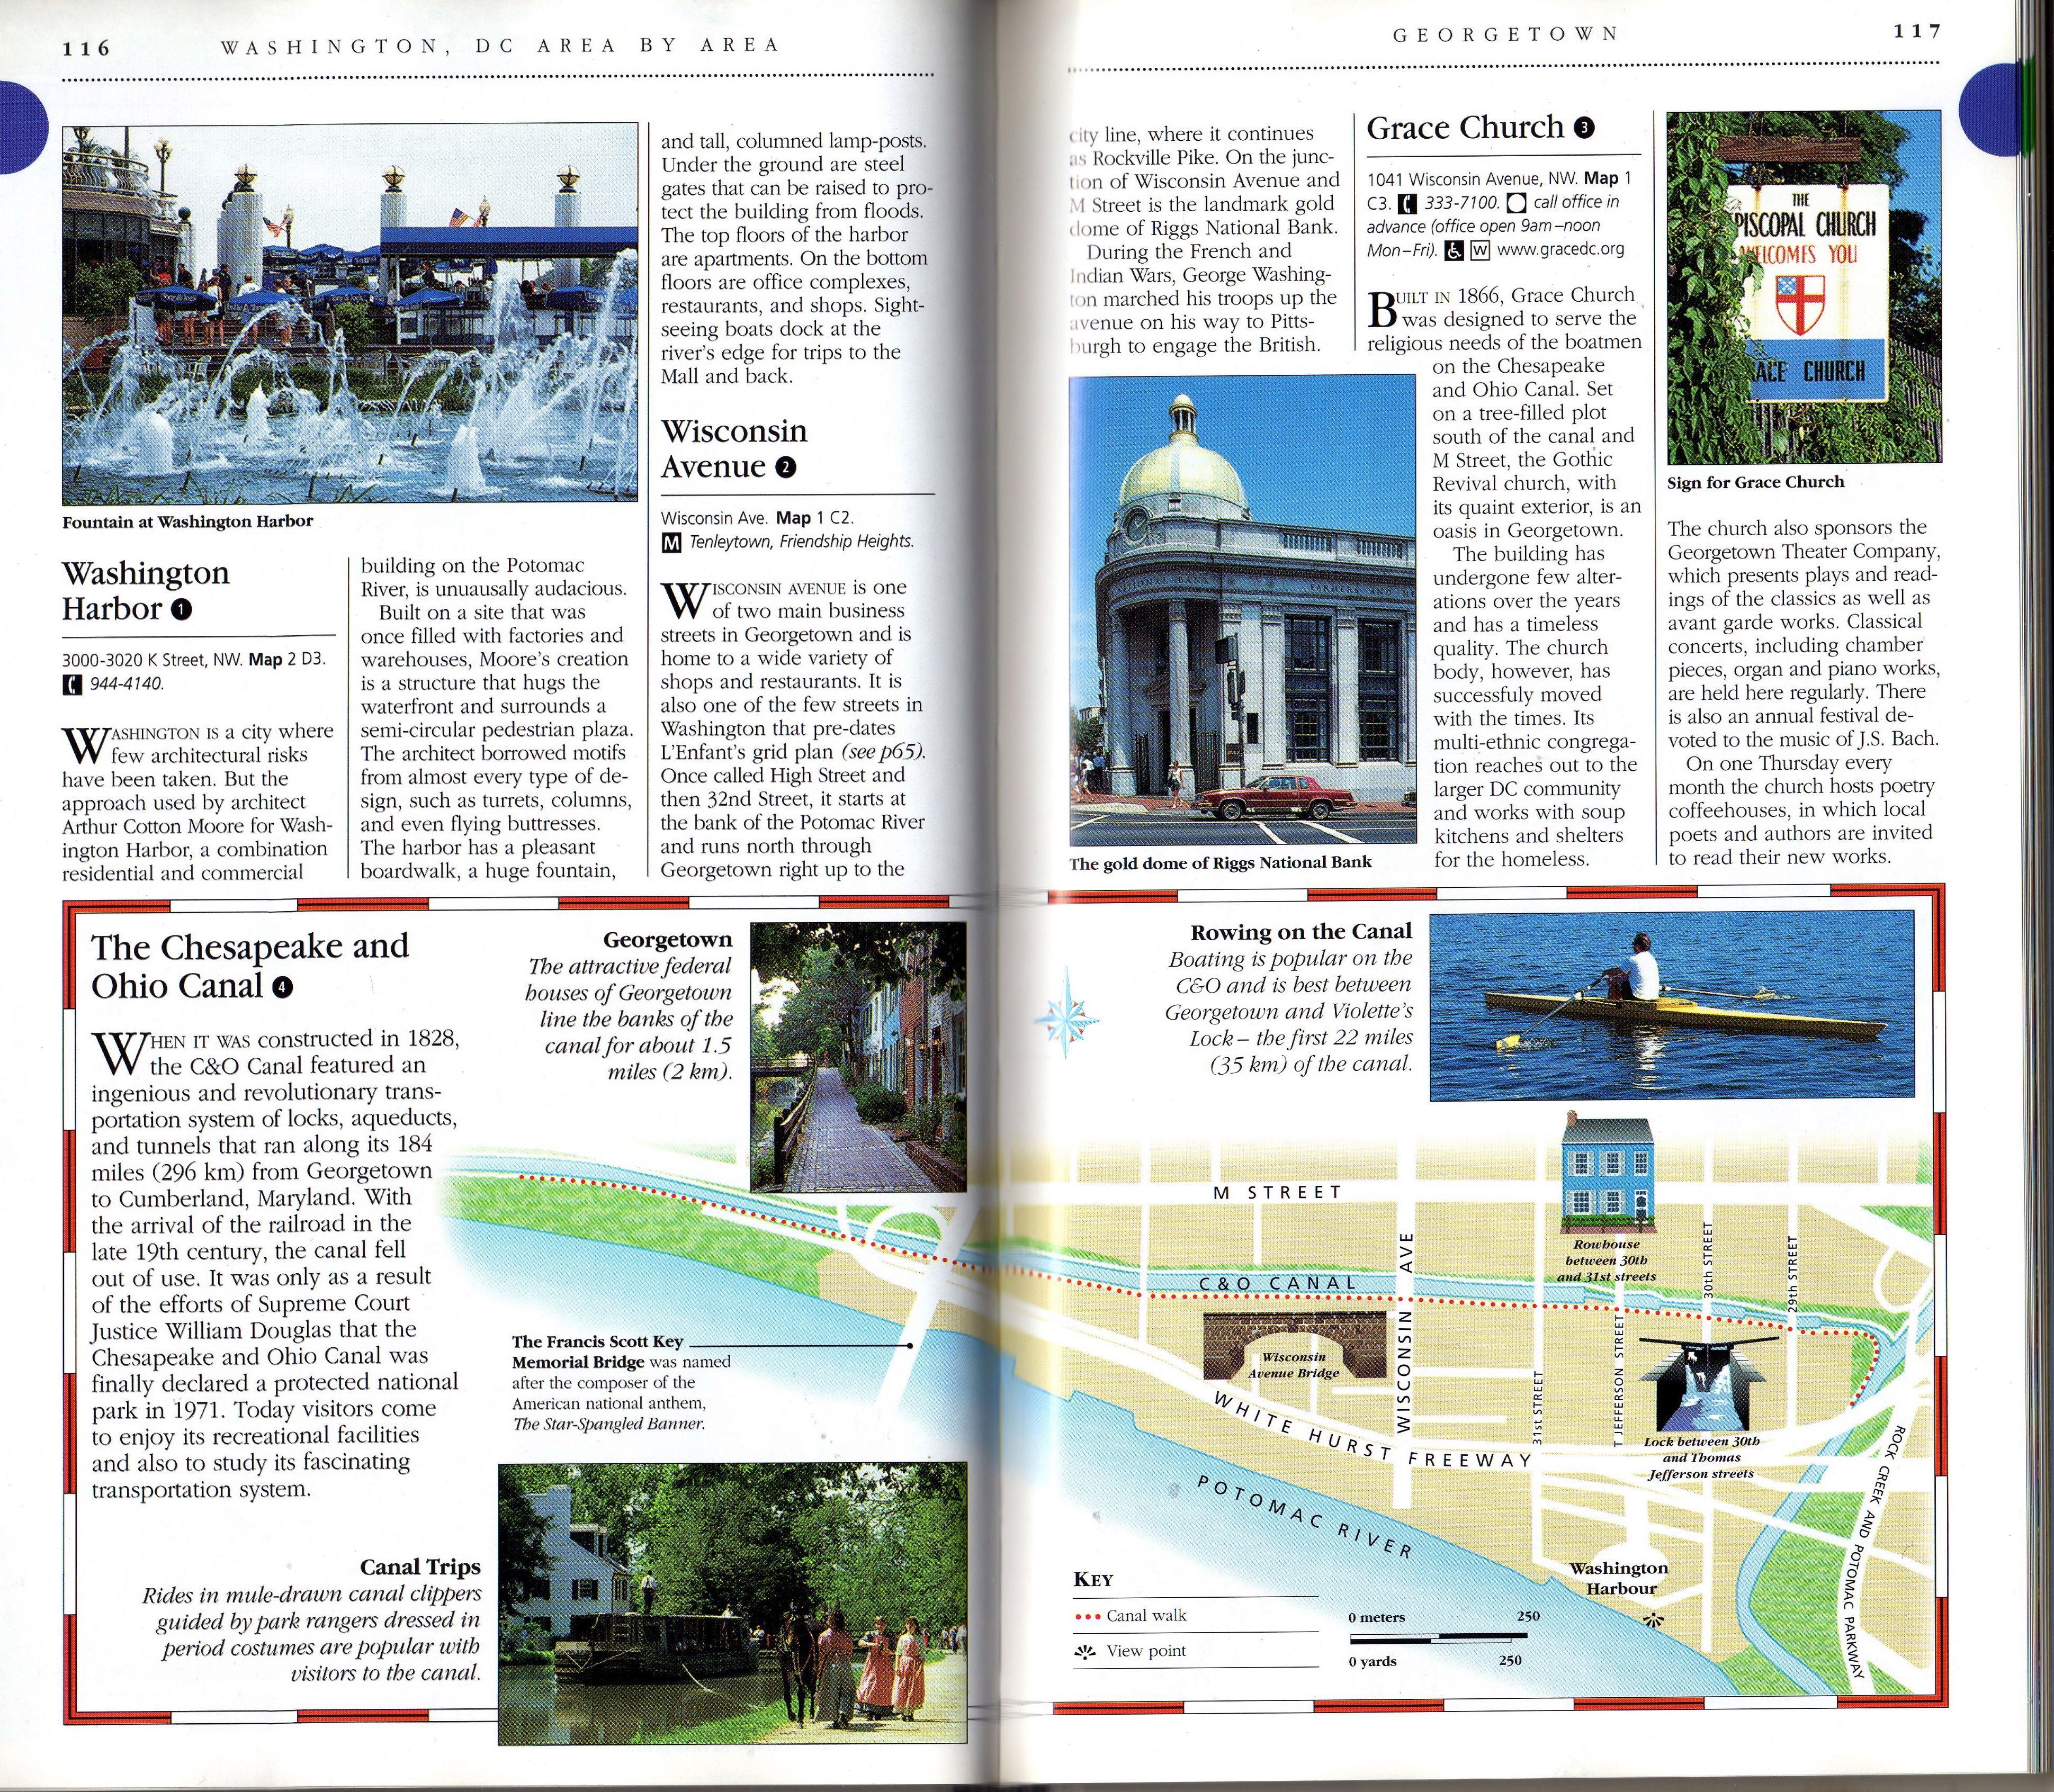 dk-guide-to-washington-georgetown1